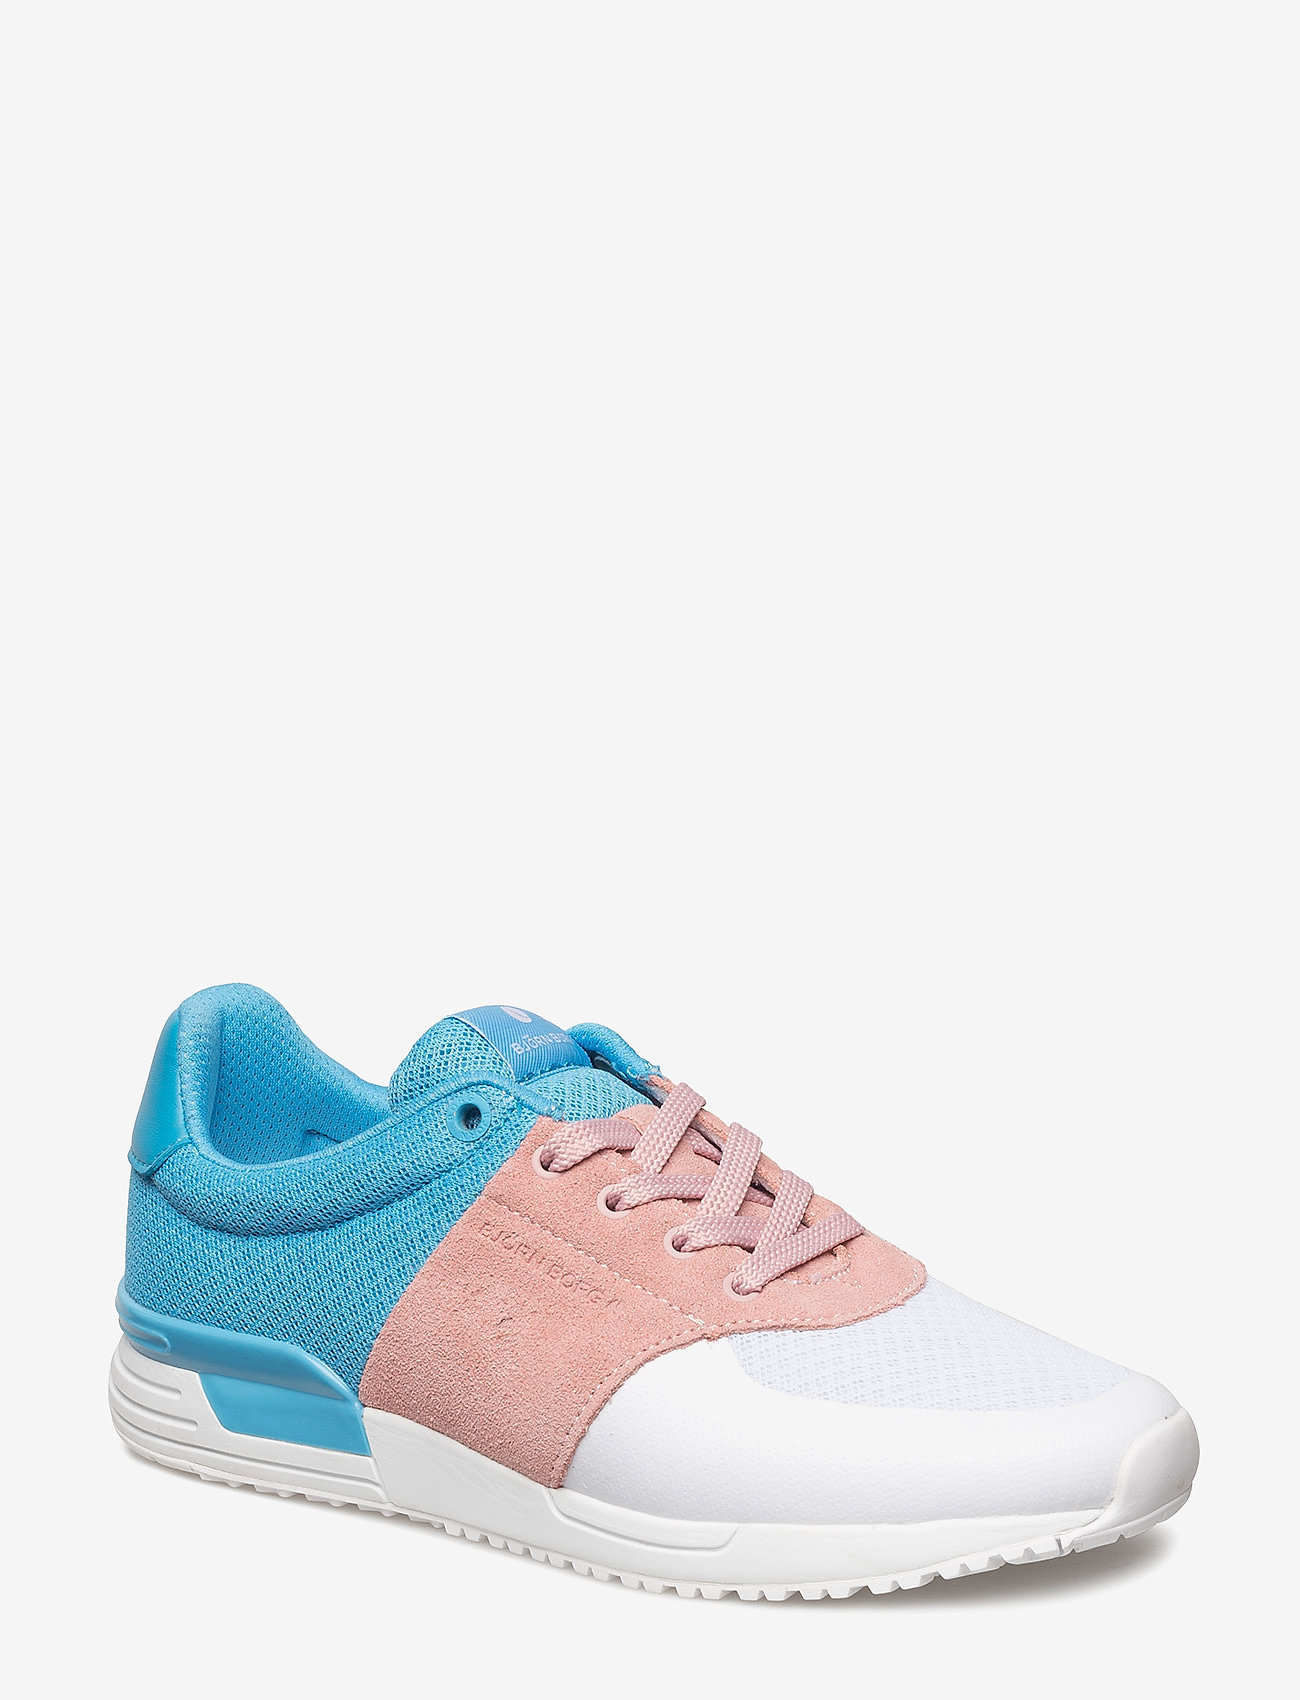 Björn Borg - R100 Low Tri W - low top sneakers - white-lt blue - 0